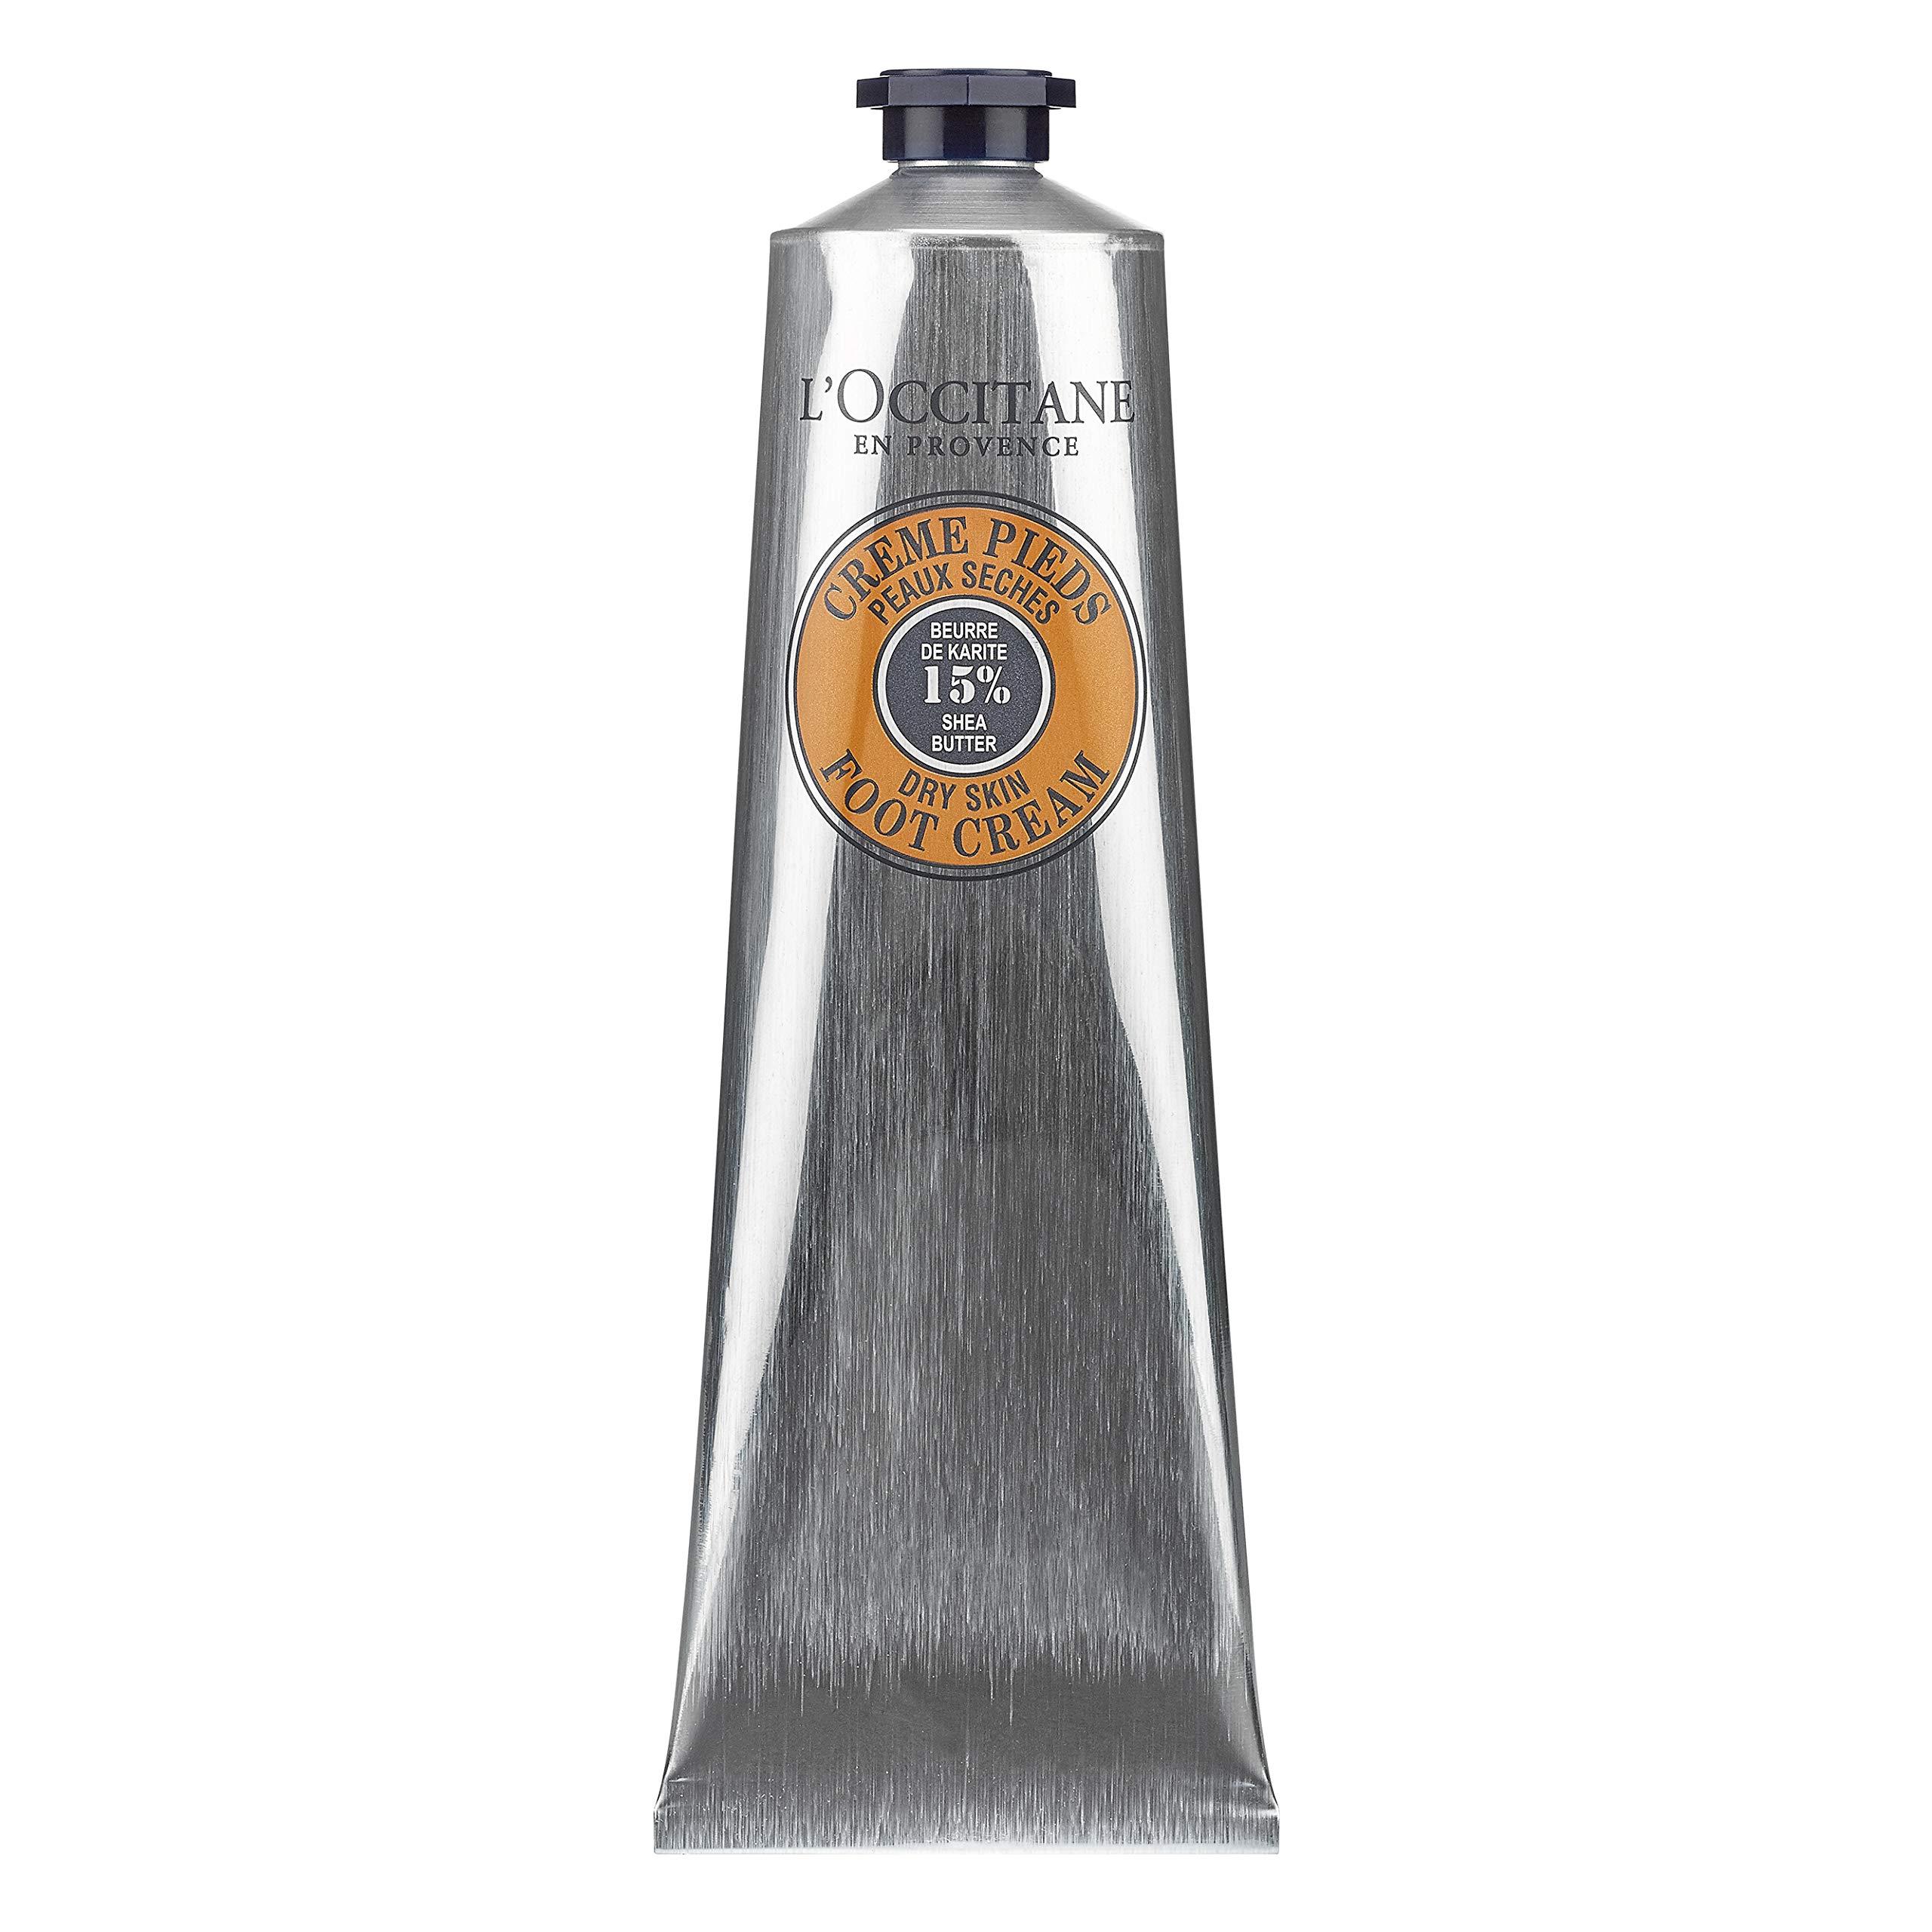 L'Occitane 15% Shea Butter Foot Cream Enriched with Lavender & Arnica, 5.2 oz. by L'Occitane